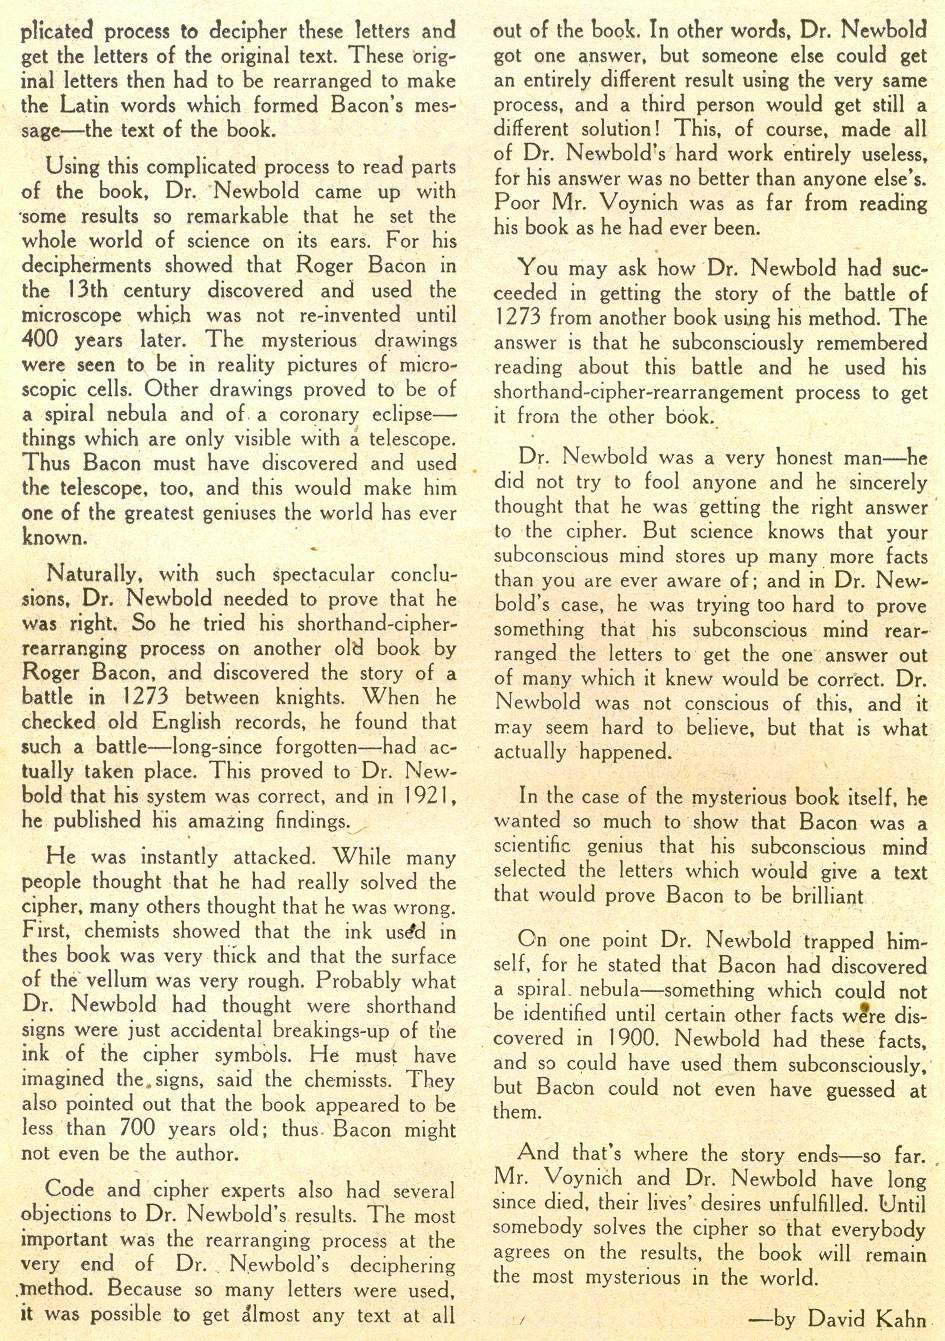 Read online Detective Comics (1937) comic -  Issue #184 - 26